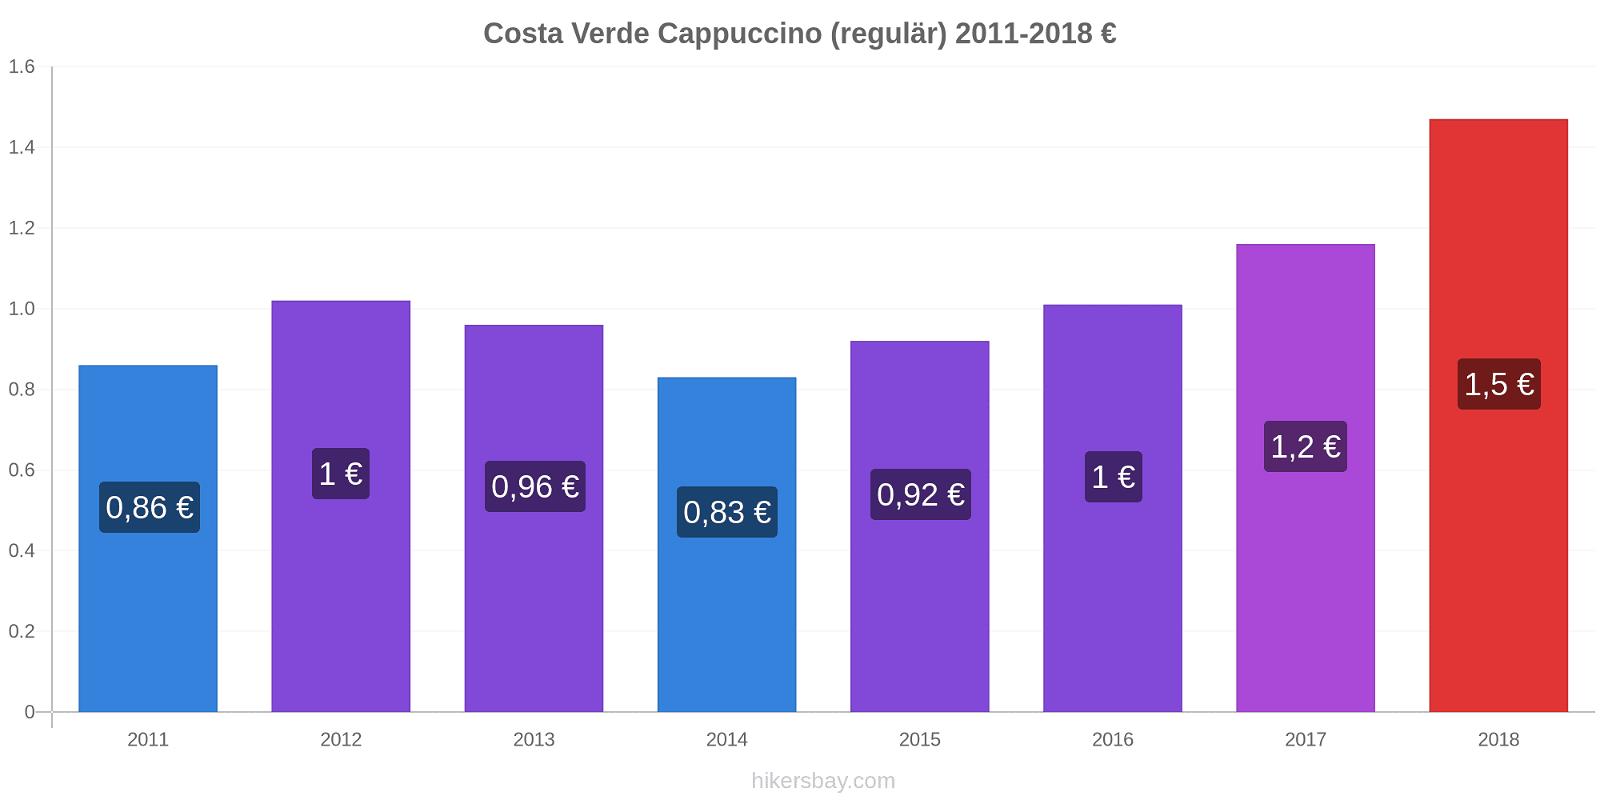 Costa Verde Preisänderungen Cappuccino (regulär) hikersbay.com